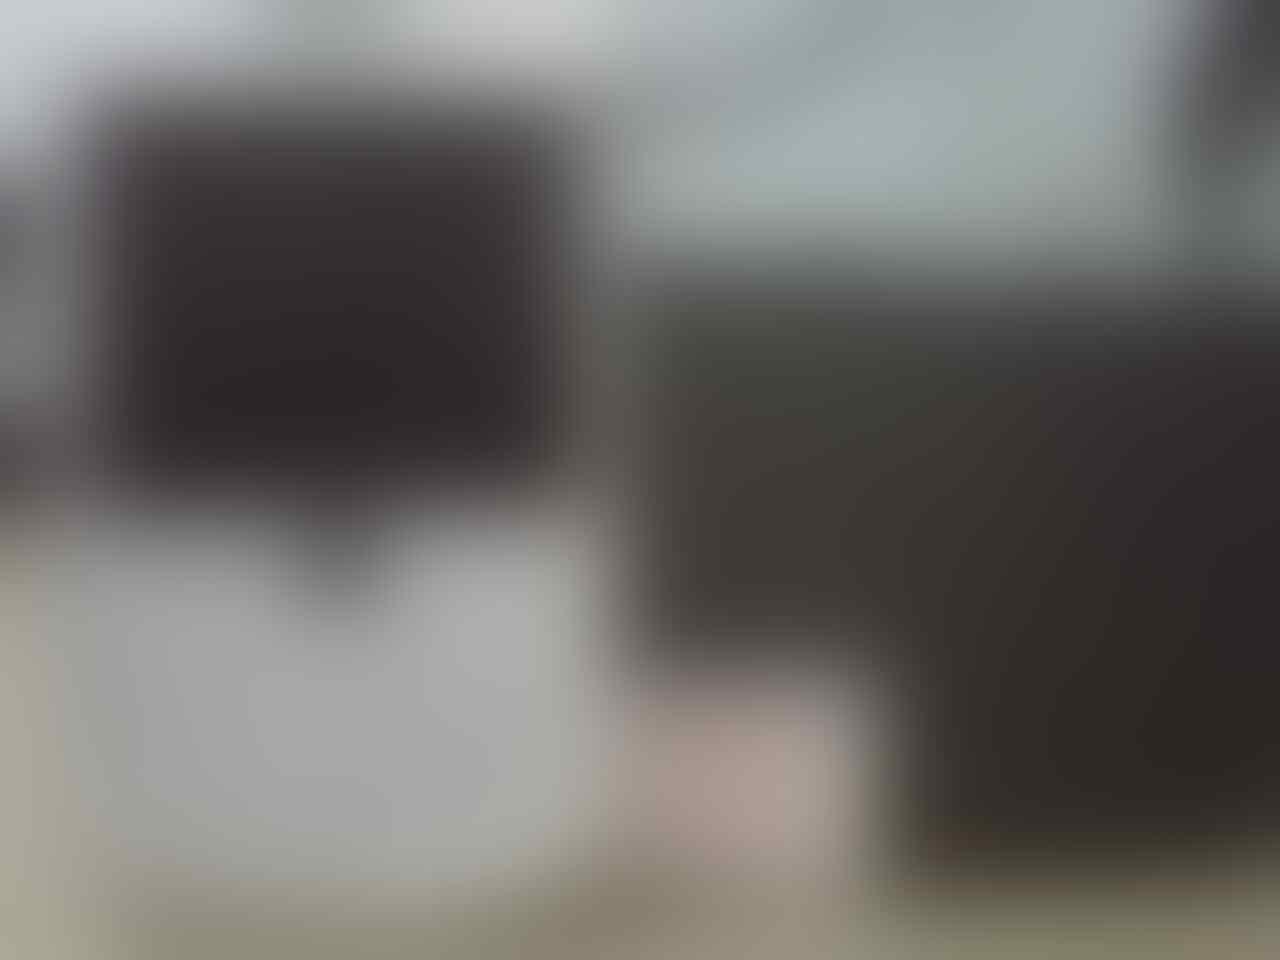 Jual Blackberry Onix 2 (BOLD 9780) Putih, second COD Bandung